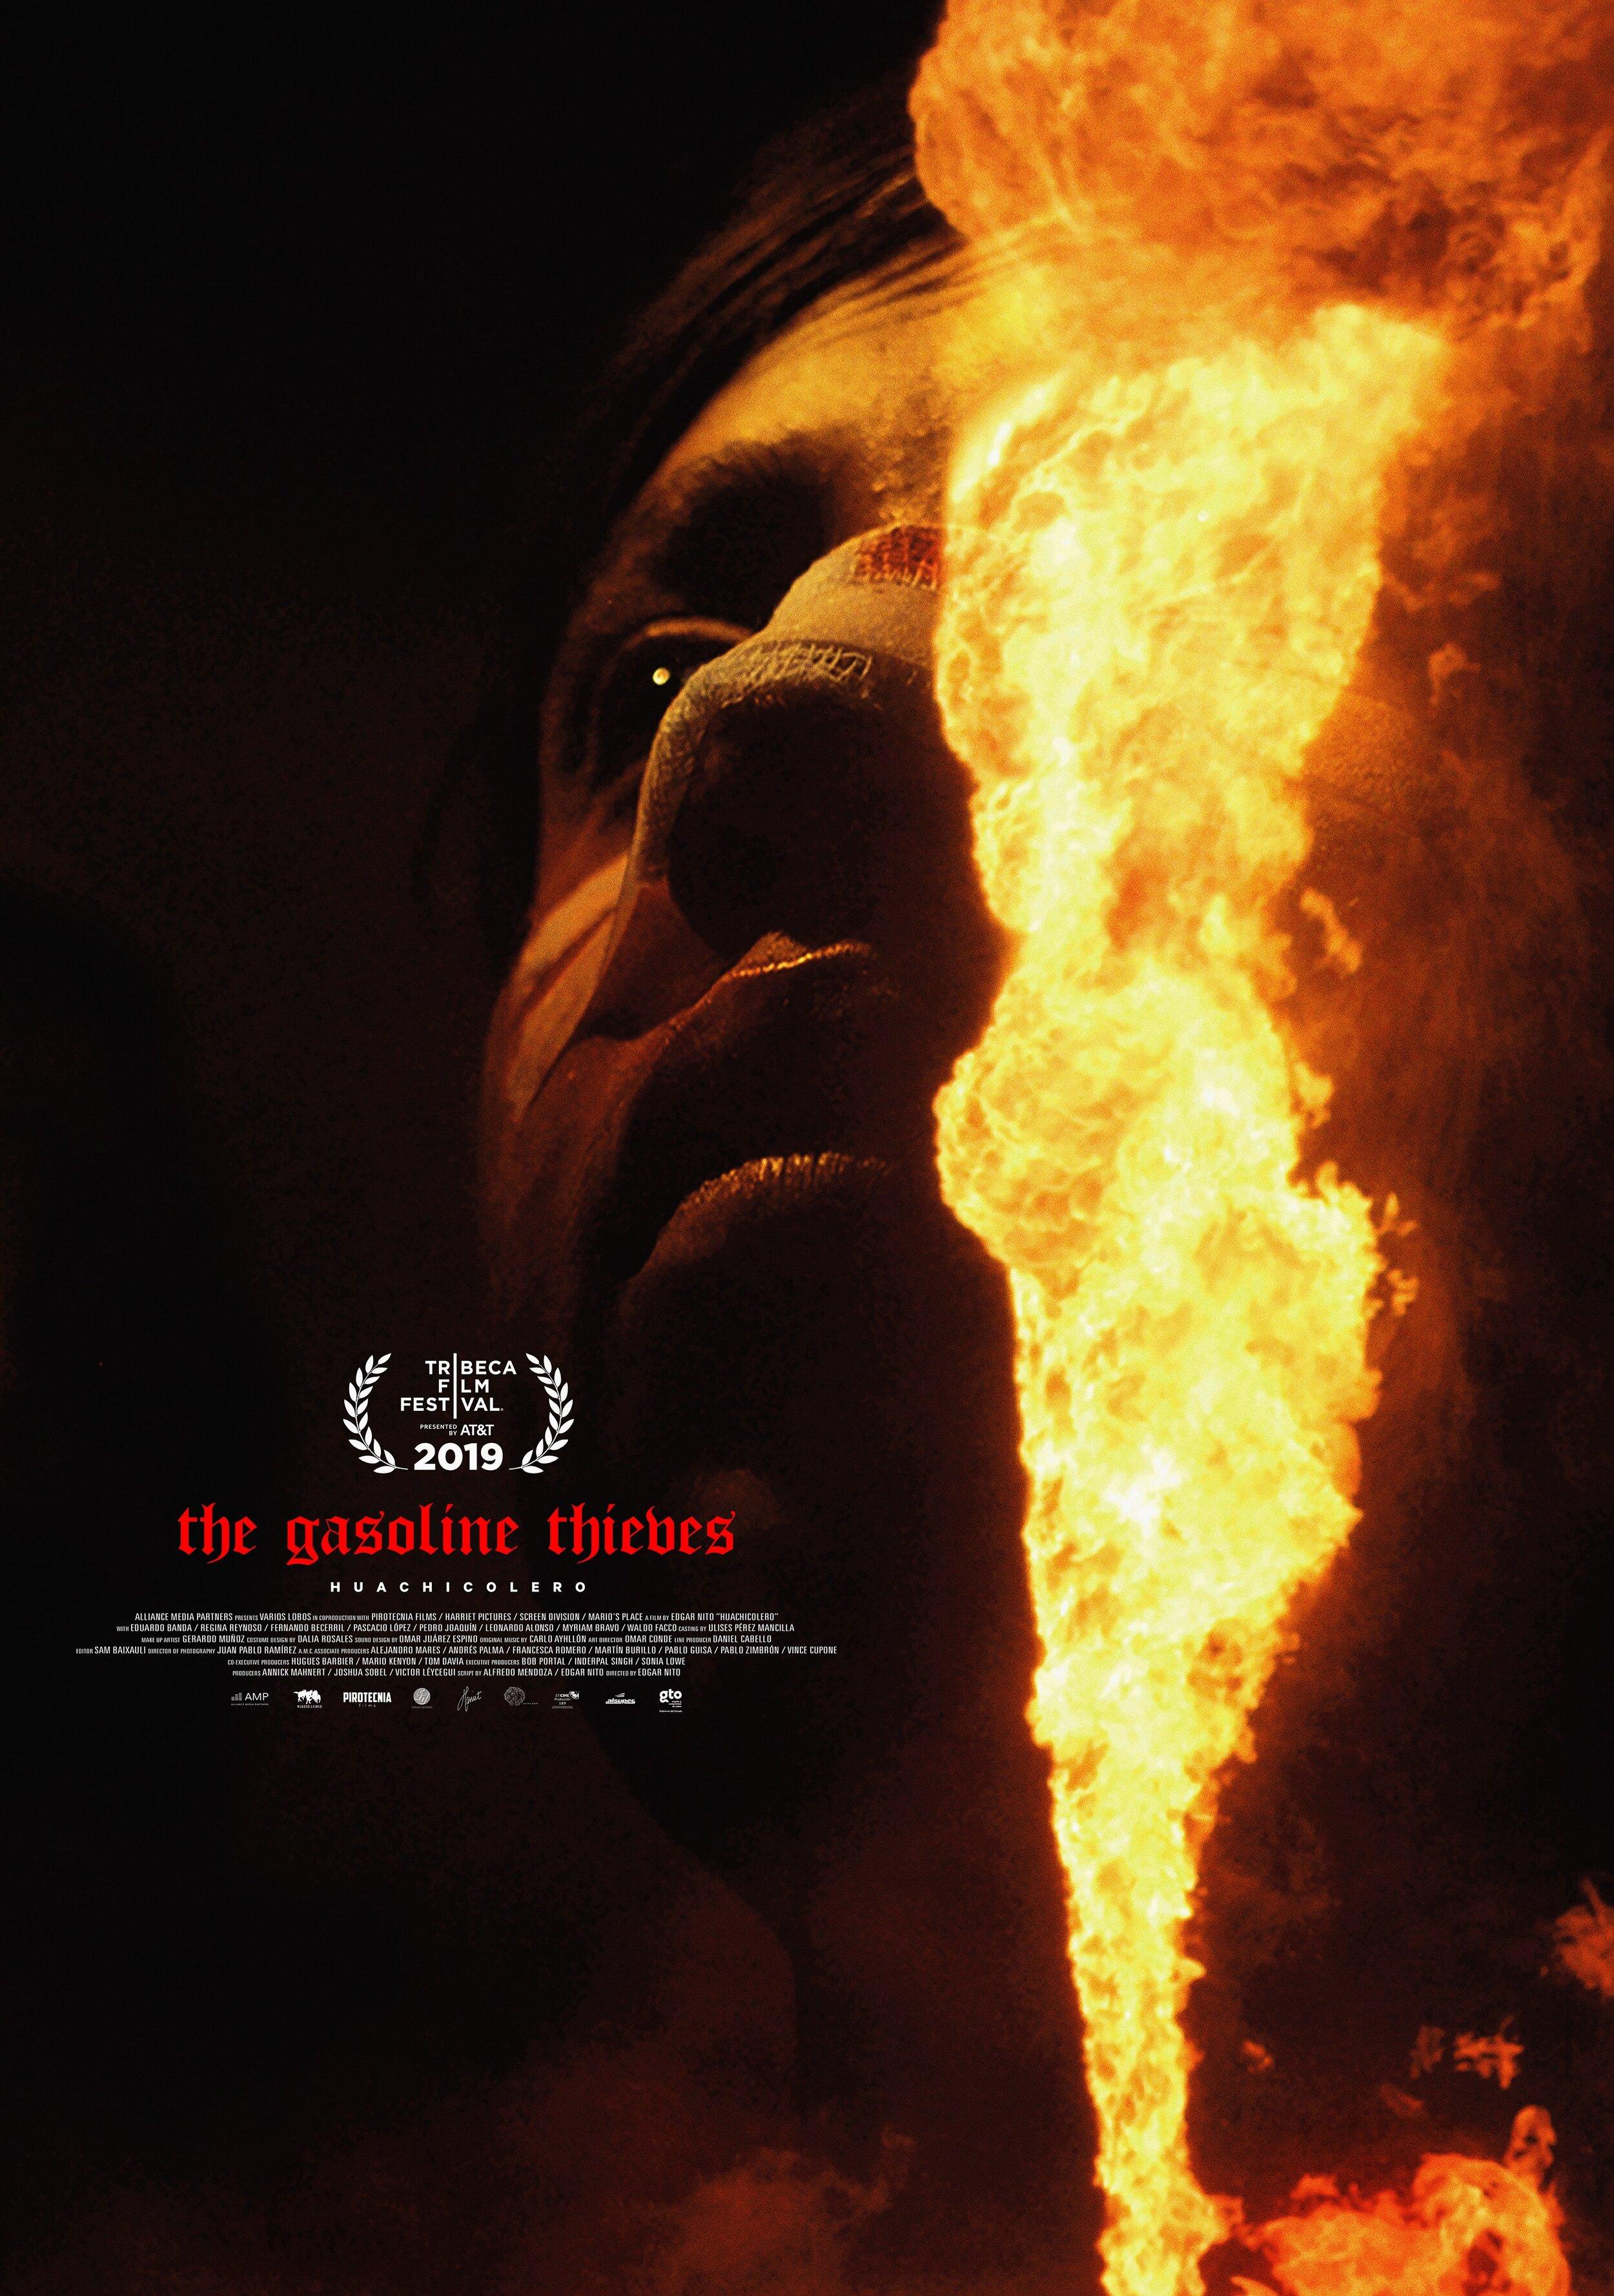 Gasoline_Thieves_Poster_01.jpg